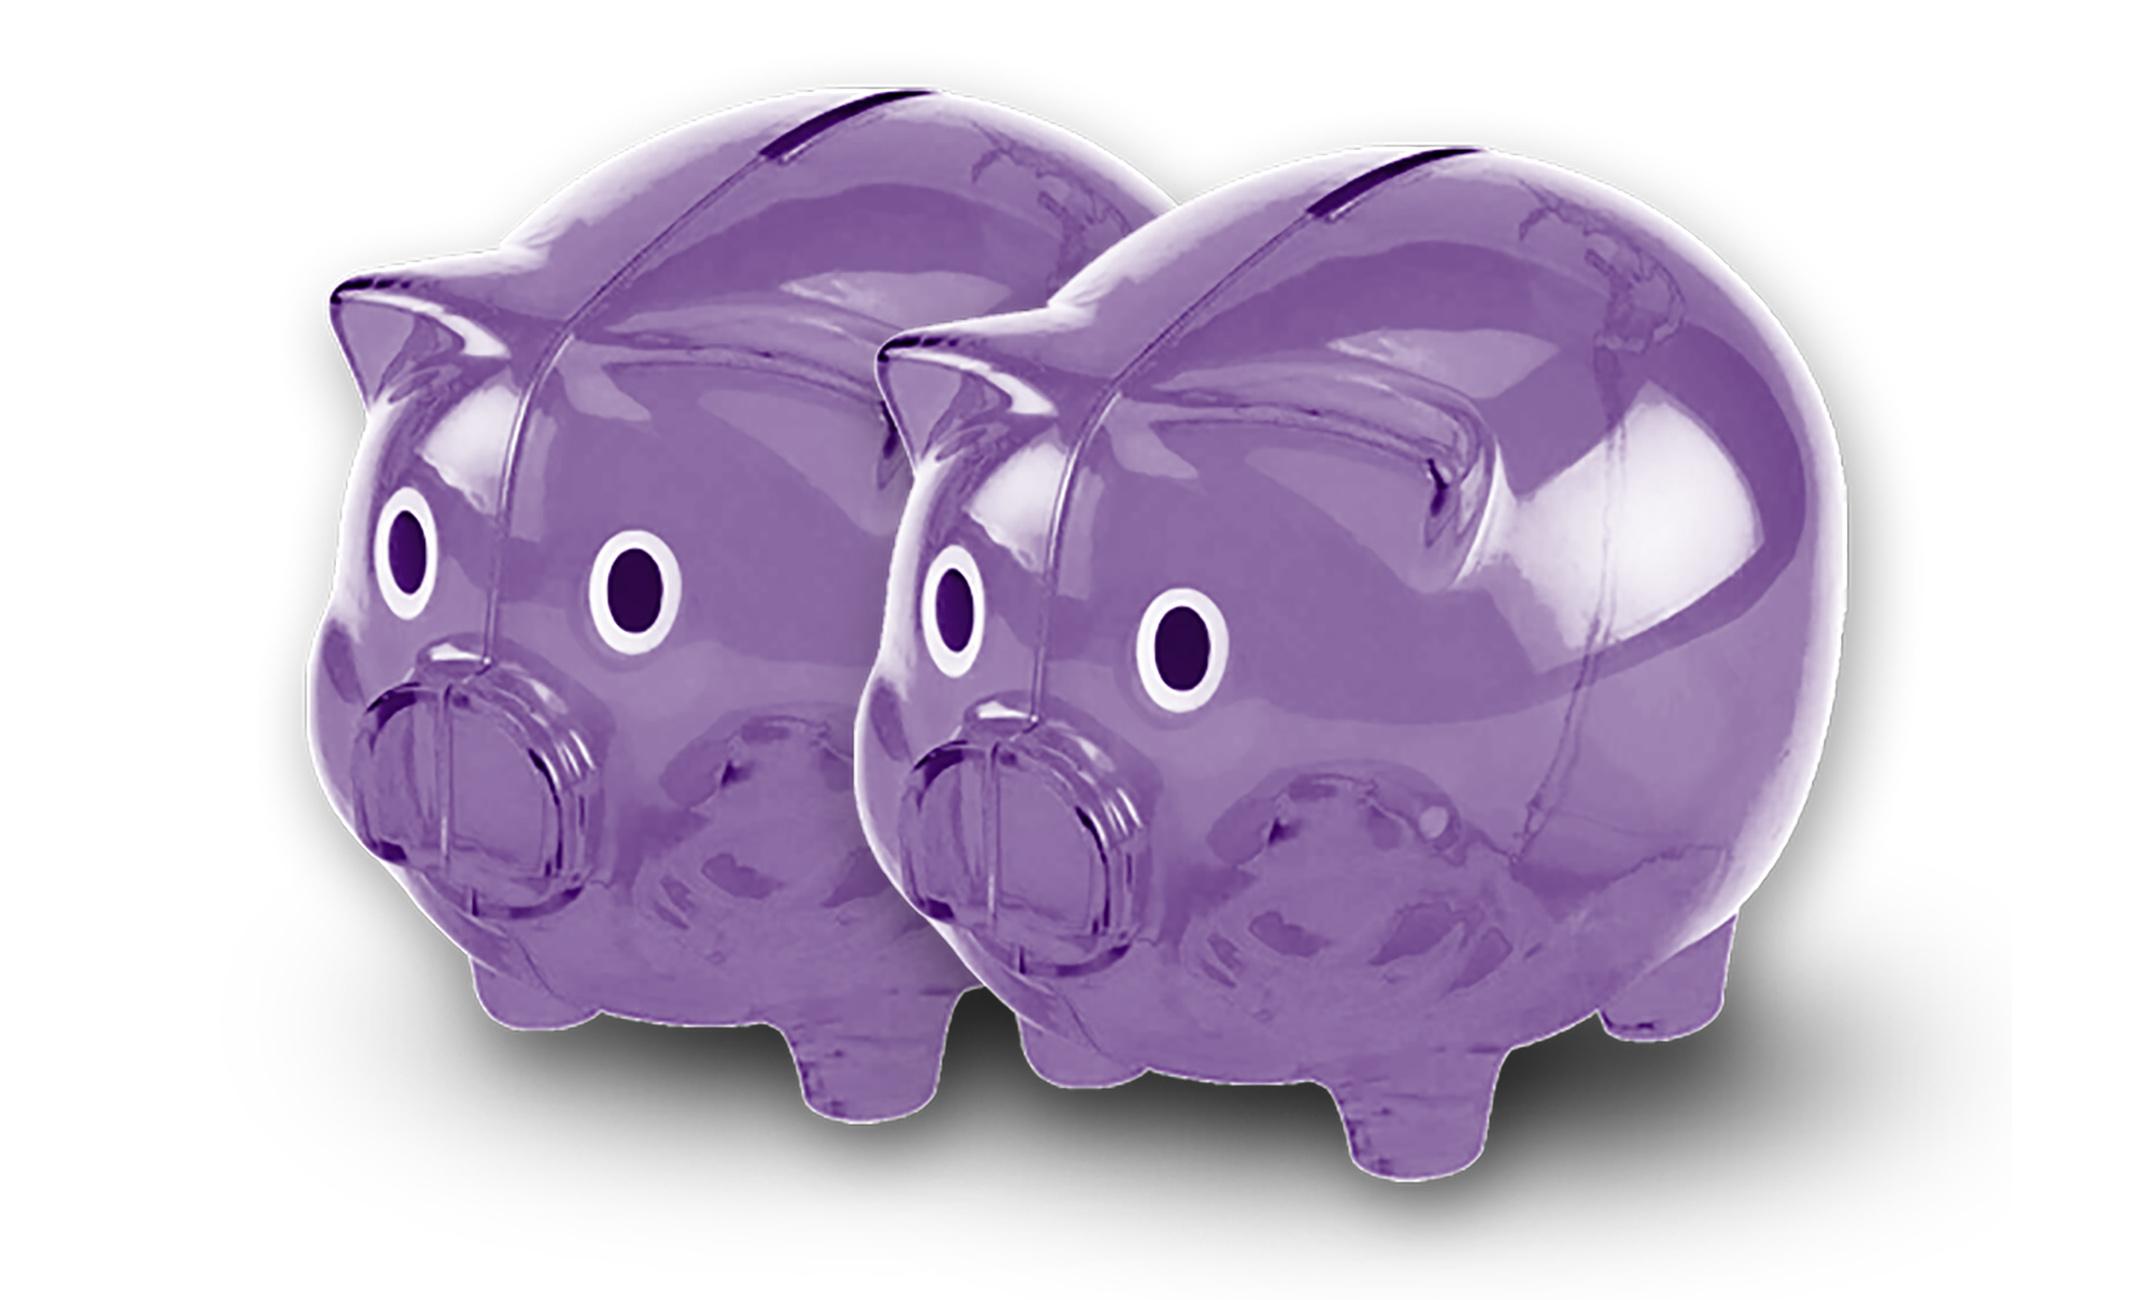 db1b34f99 Purple Transparent Cute Piggy Bank